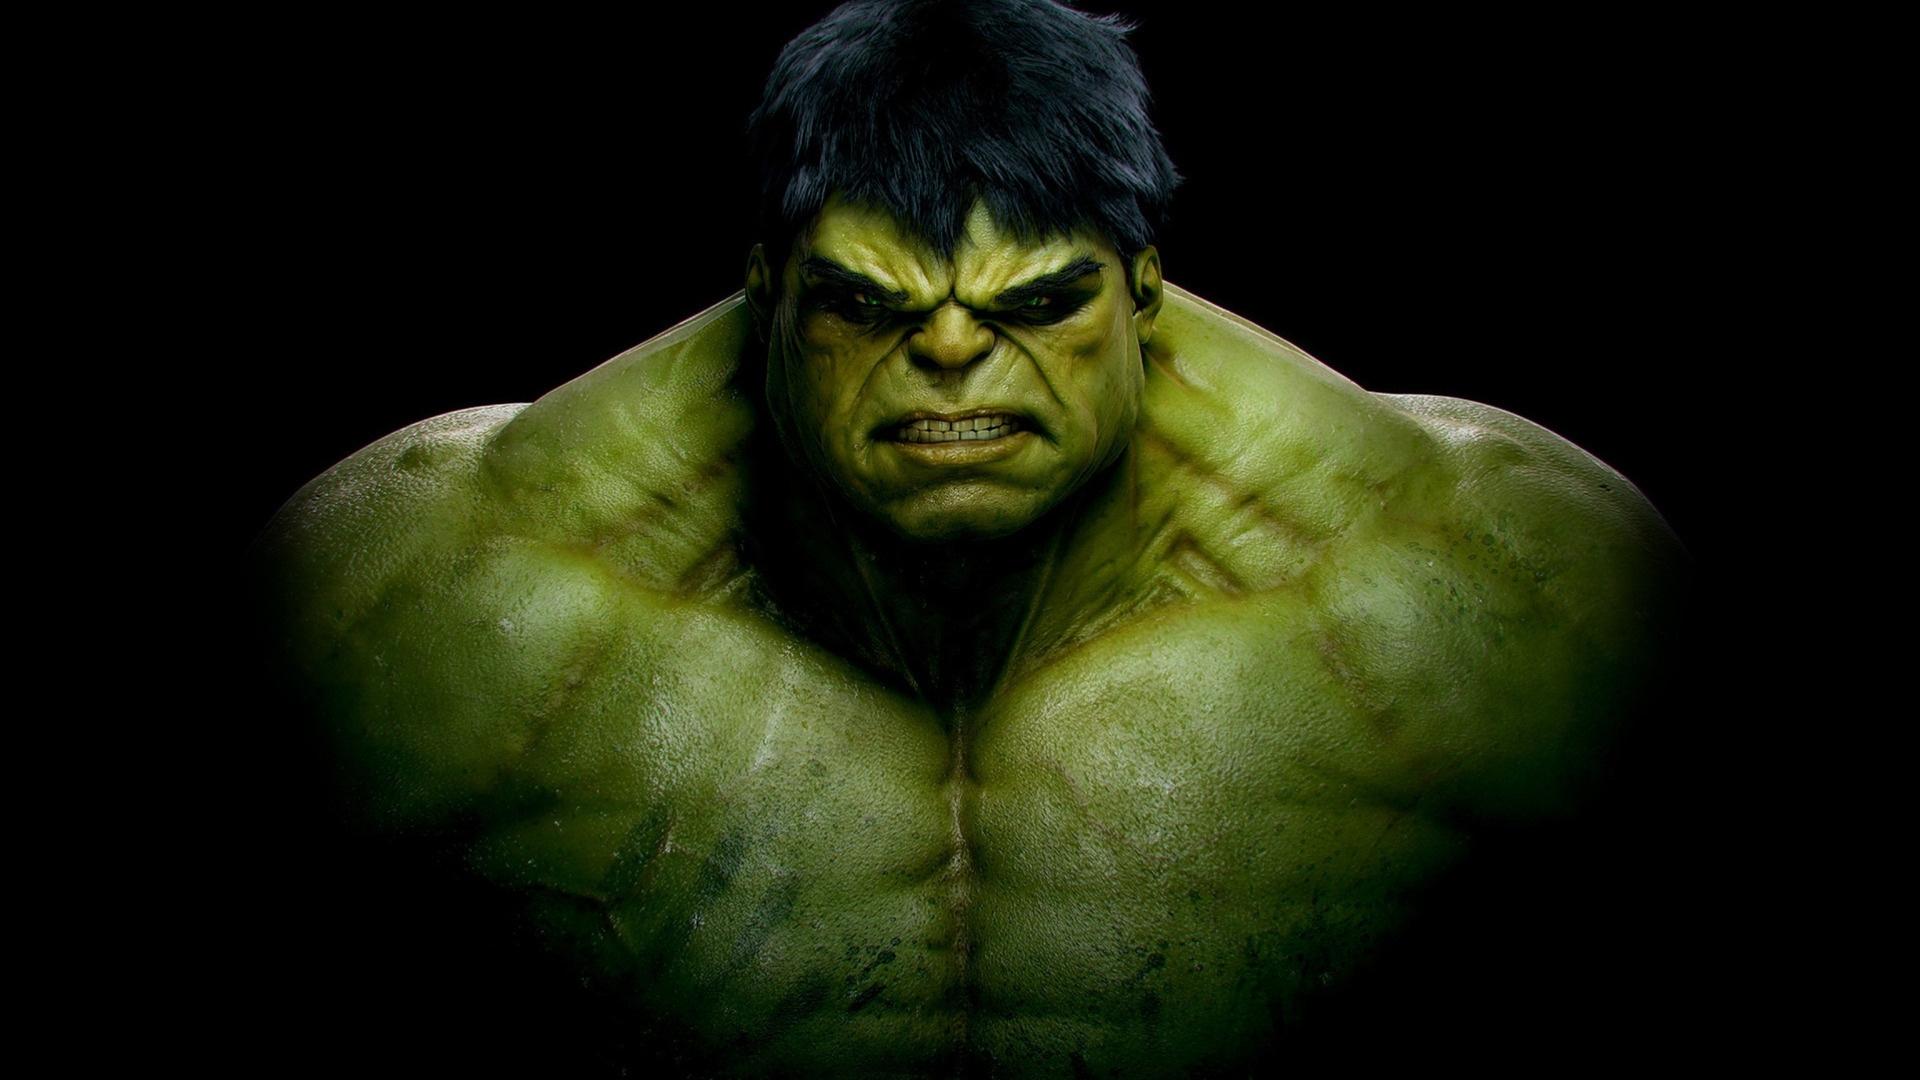 1920x1080 Px Hulk Incredible Marvel Superhero